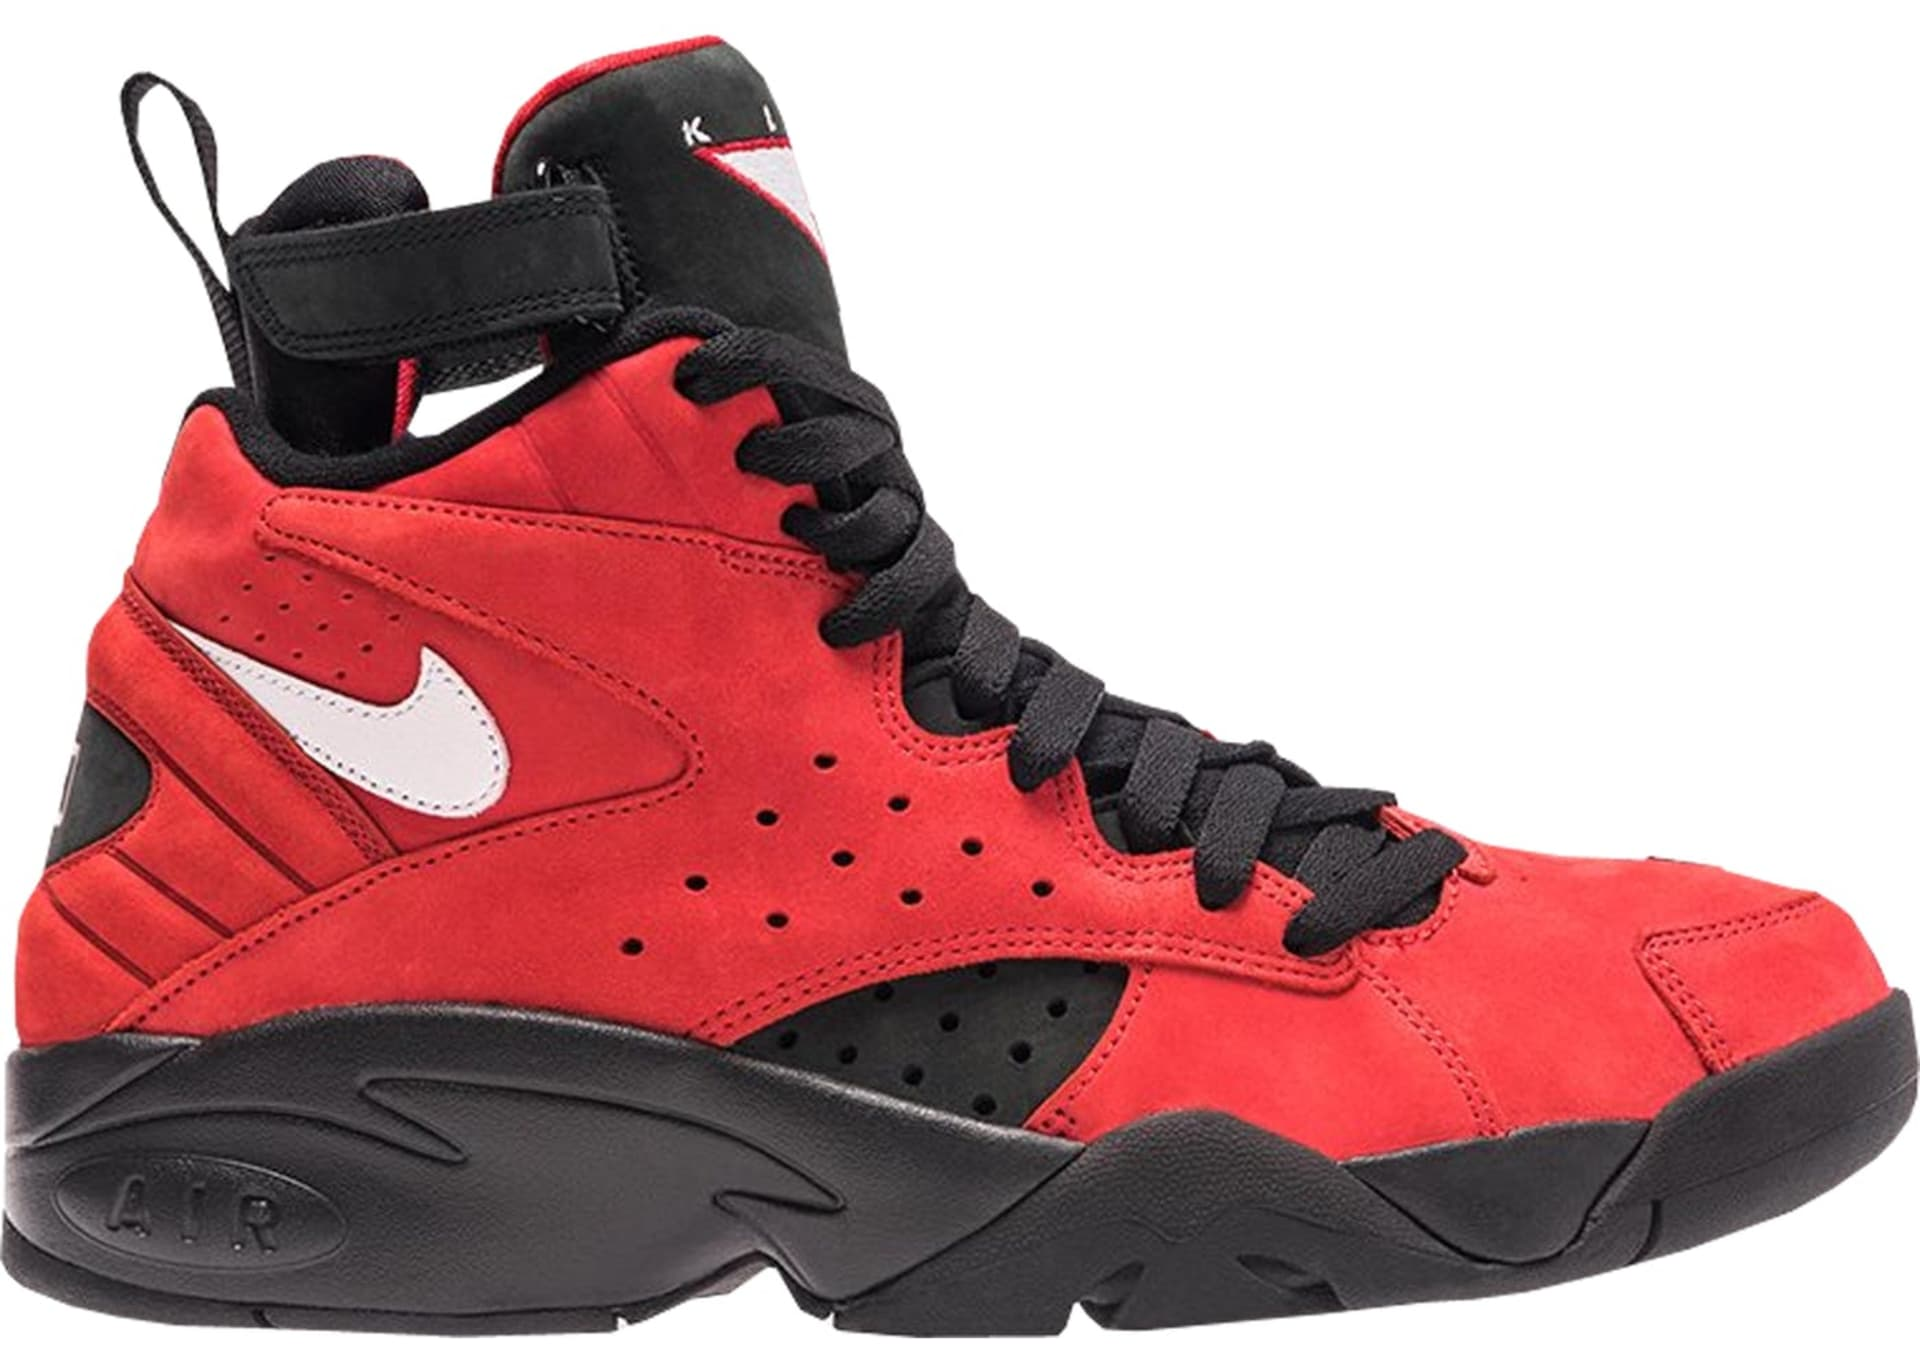 low priced 7a47a 359af Kith x Nike Maestro II